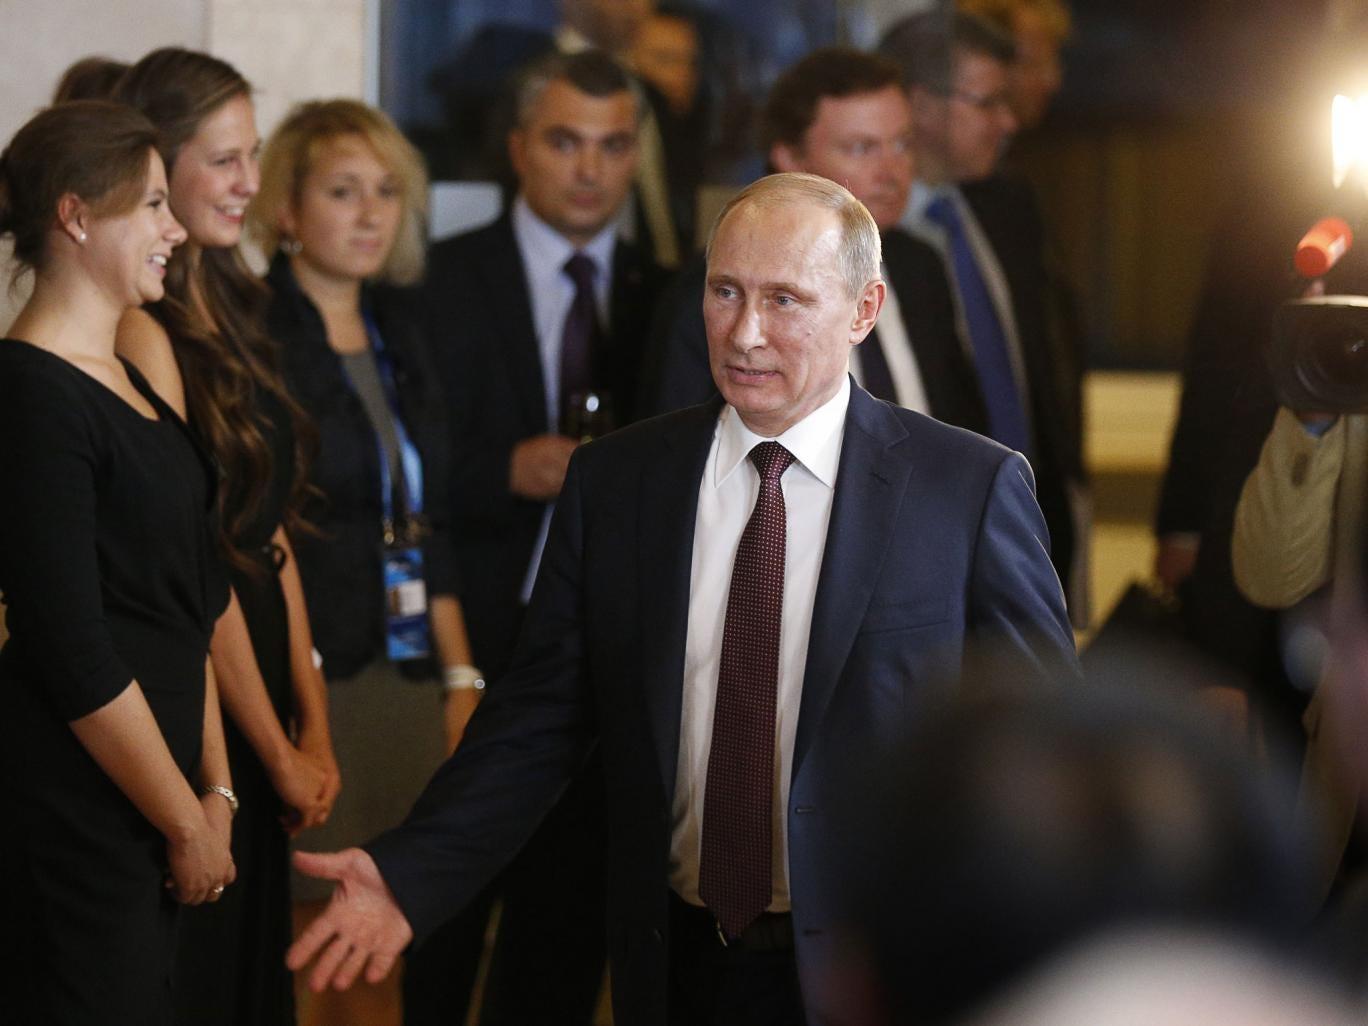 Russian President Vladimir Putin gestures as he leaves the final plenary meeting of the Valdai International Discussion Club in the Novgorod Region